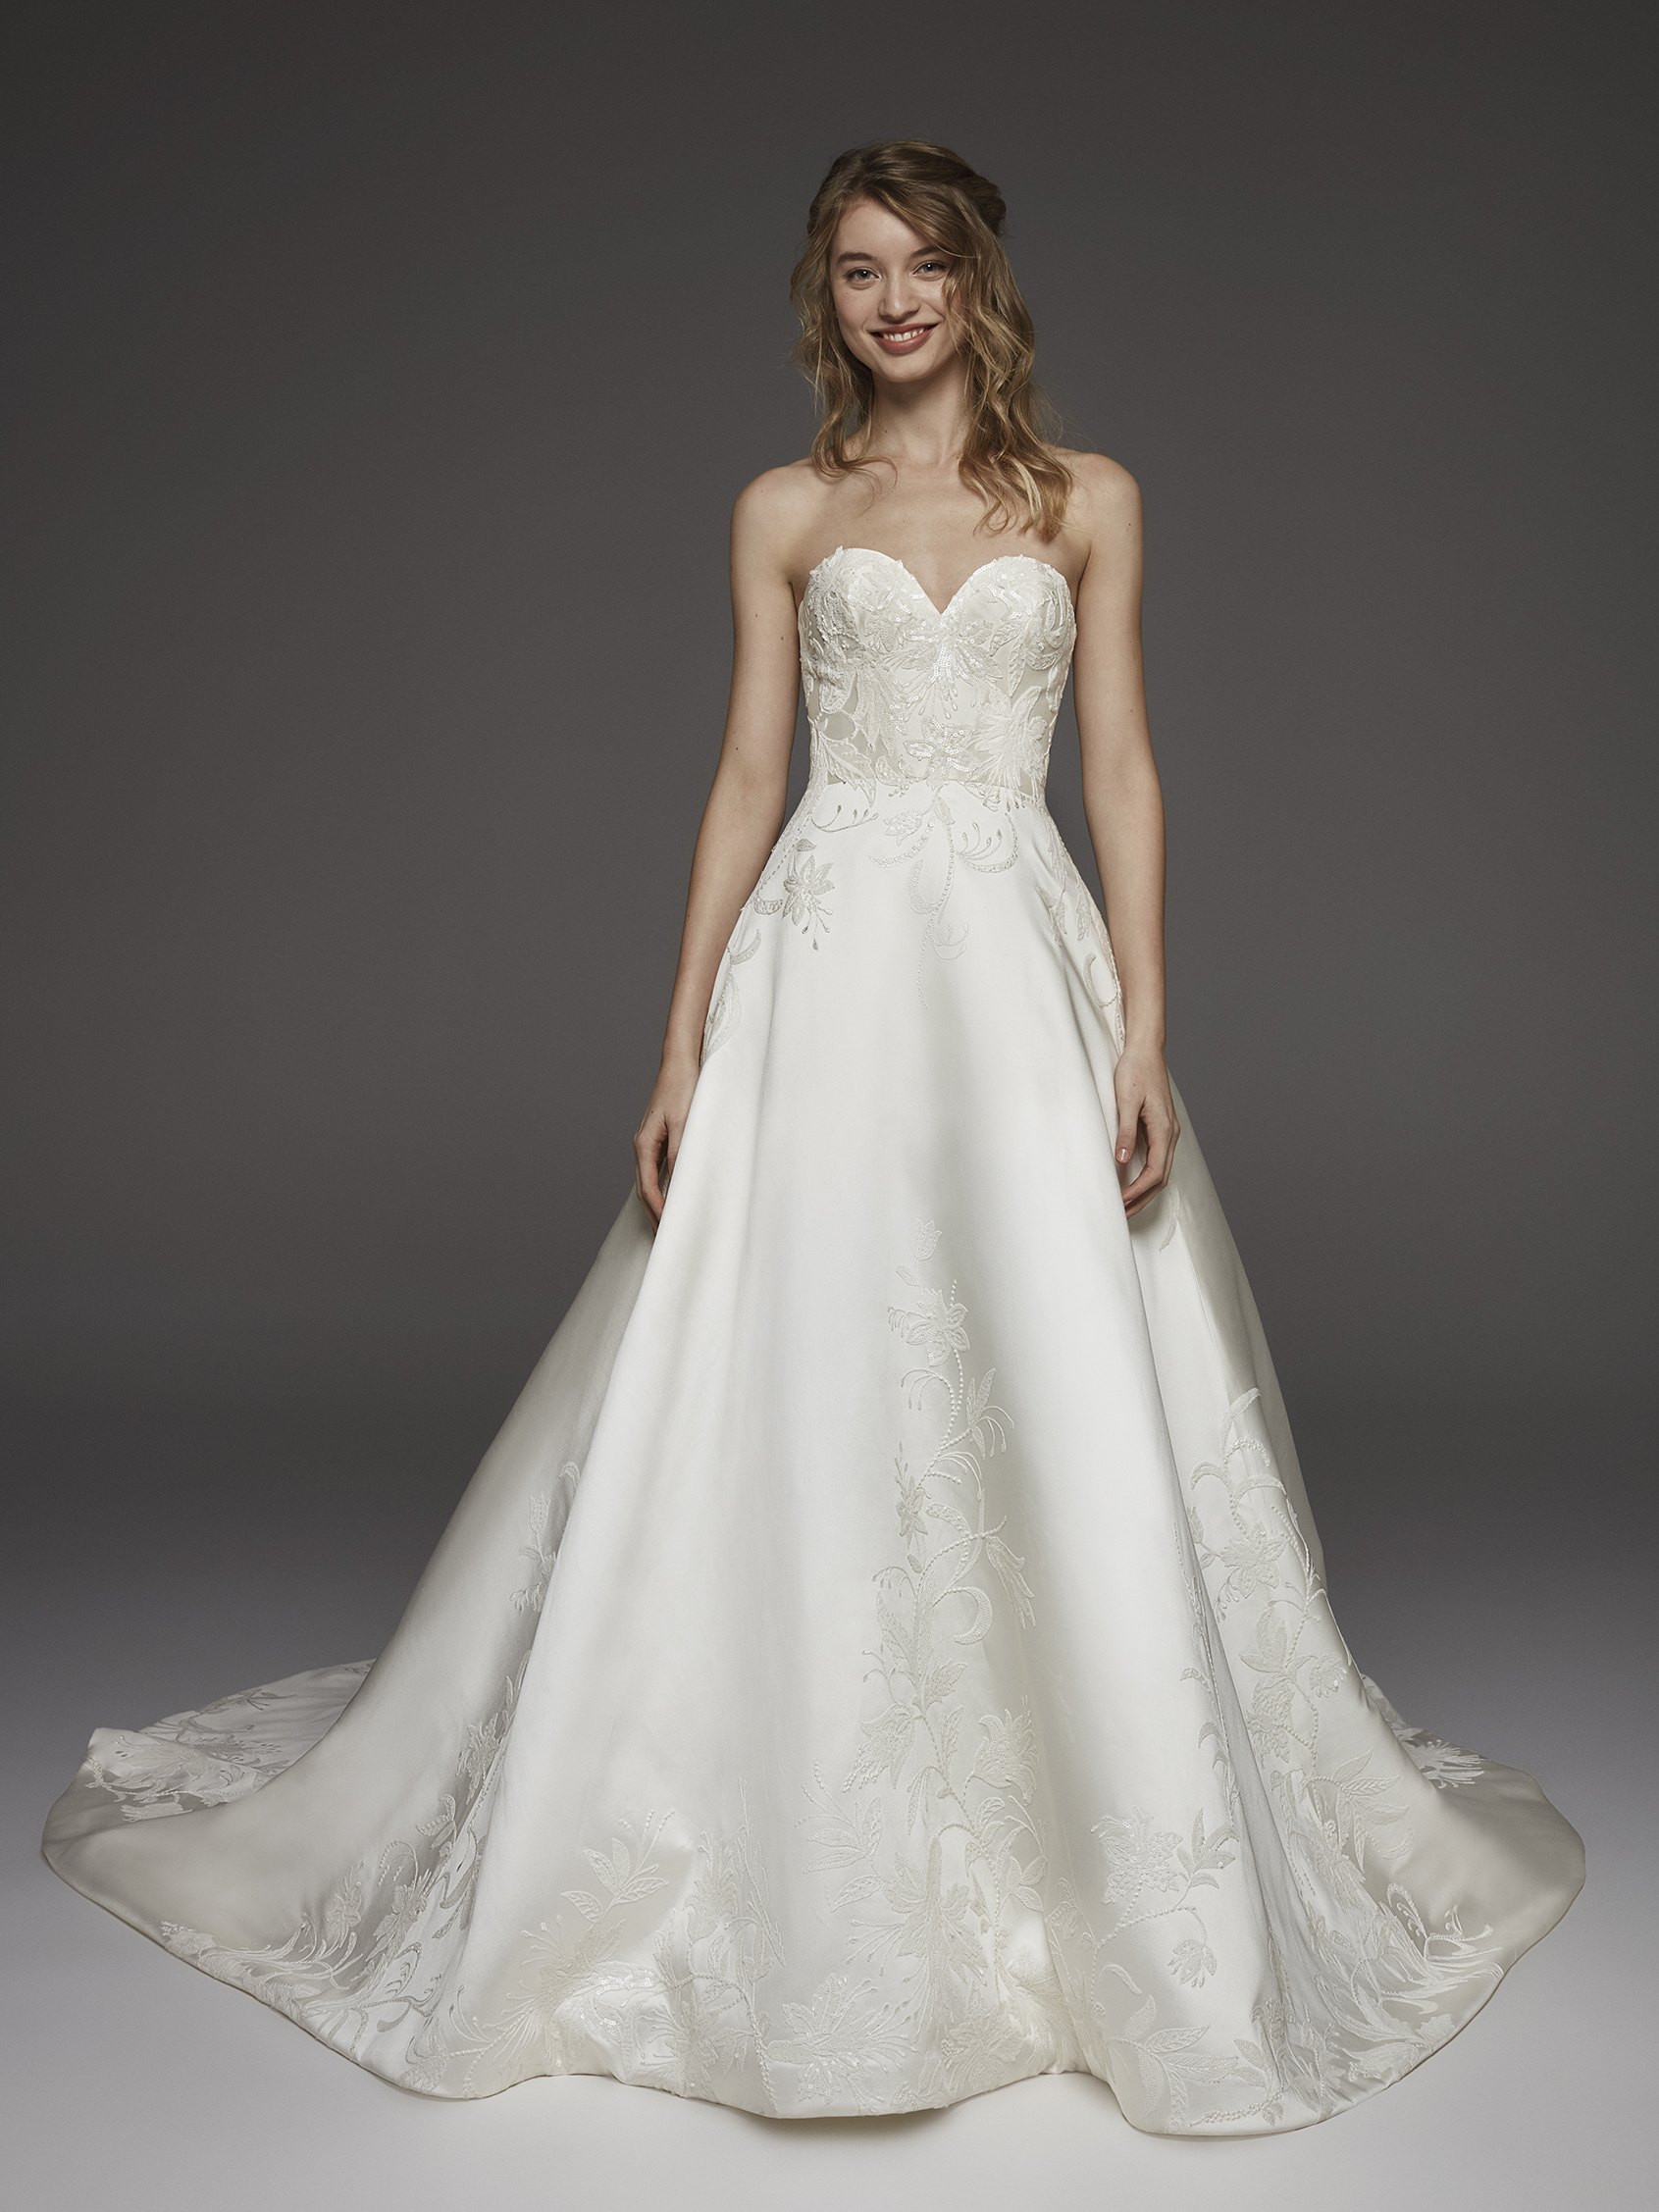 Mira Couture Atelier Pronovias Hela Wedding Dress Bridal Gown Chicago Boutique Front